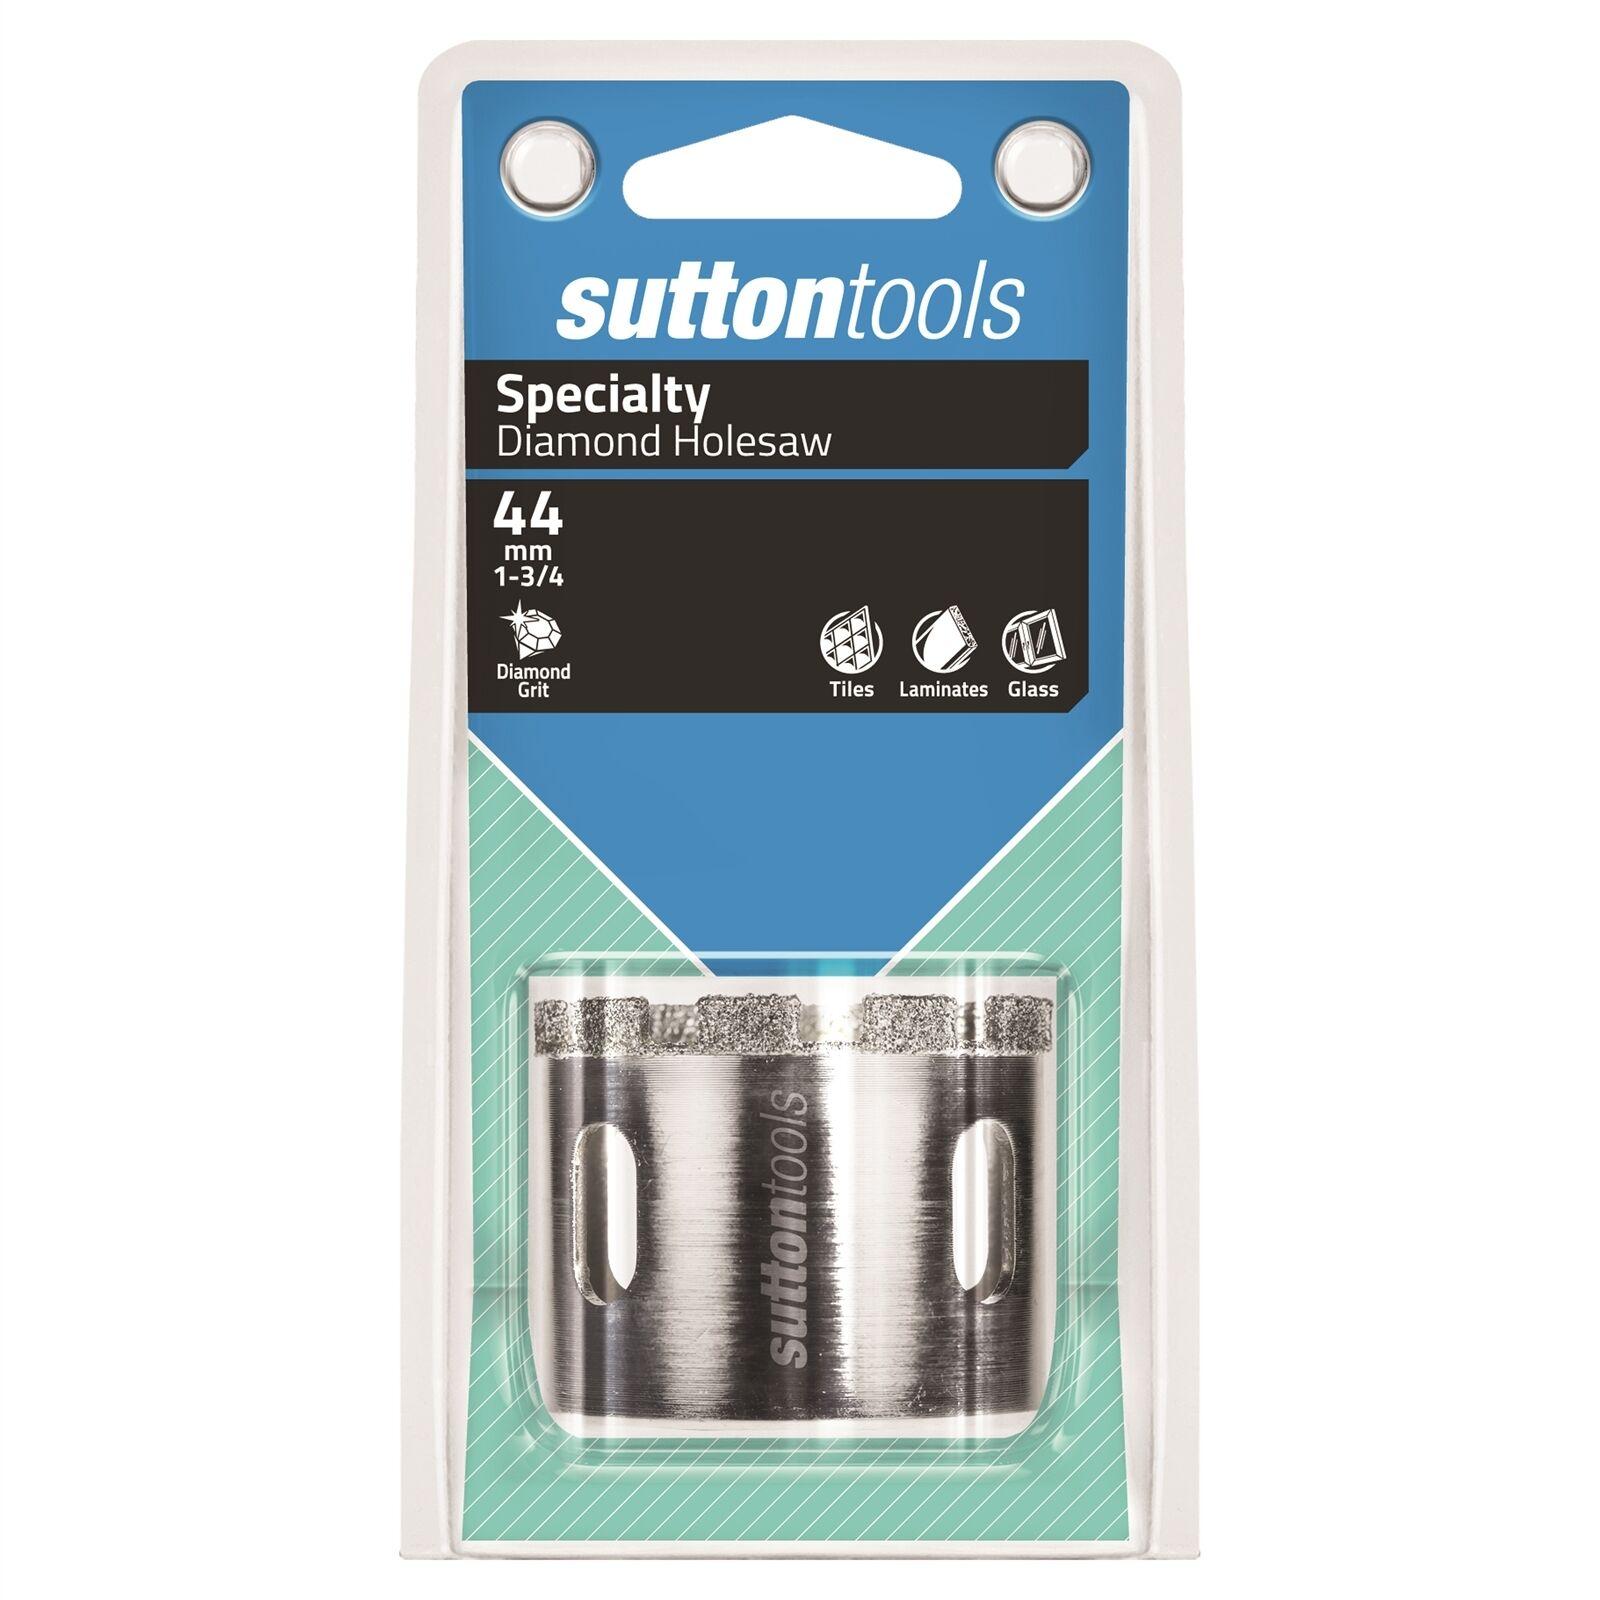 Sutton Tools DIAMOND GRIT HOLESAW Cut-Out SlotsAustralian Brand- 44, 51 Or 54mm